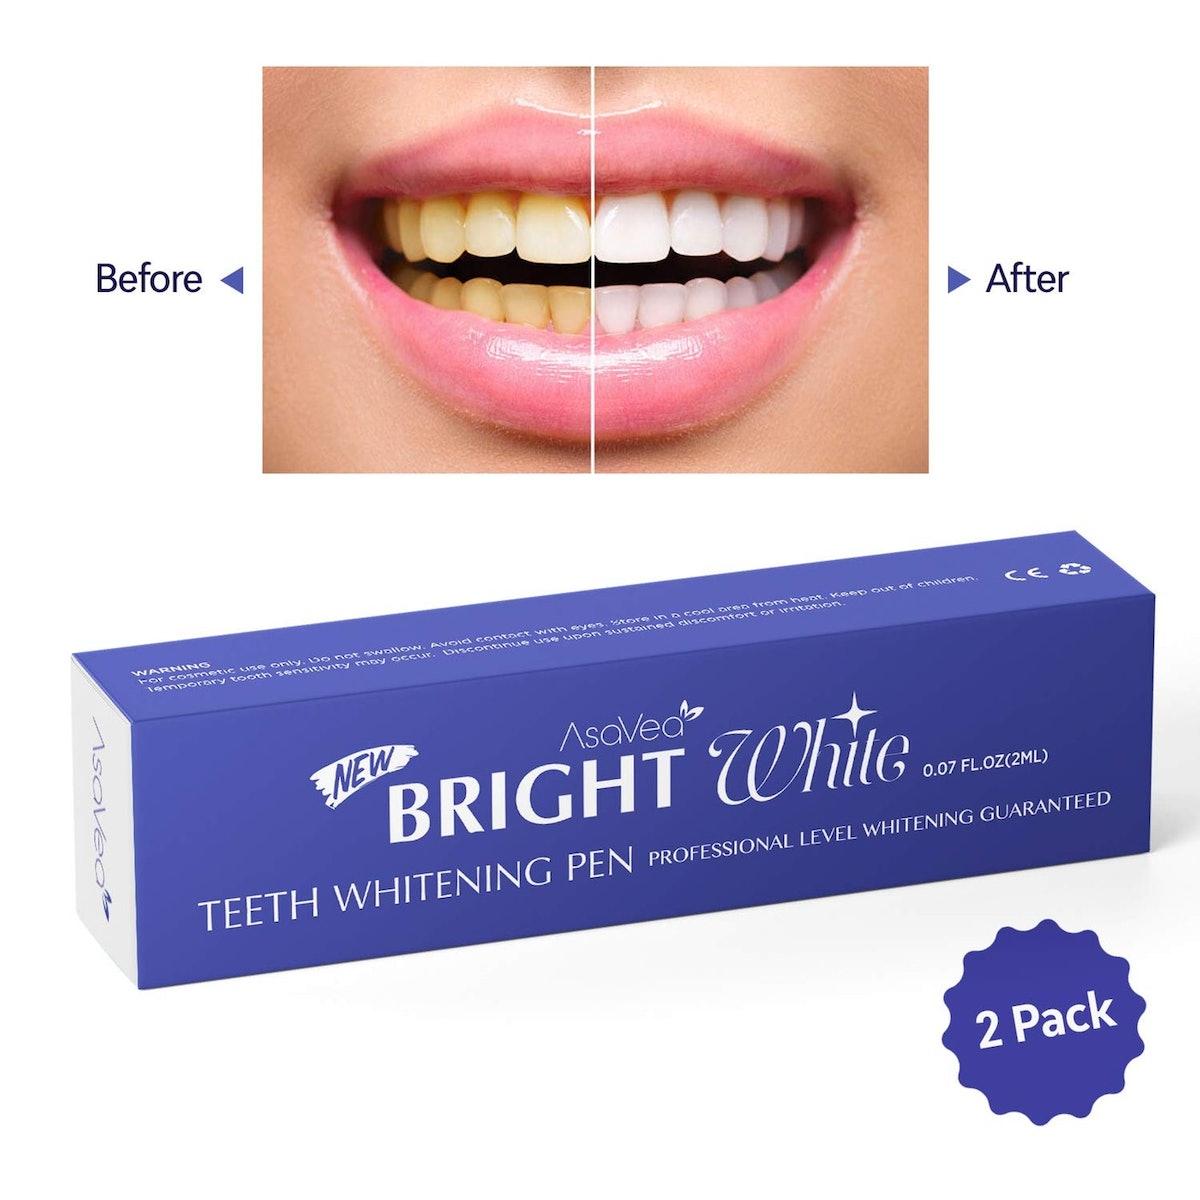 AsaVea Teeth Whitening Pen (2 Pack)